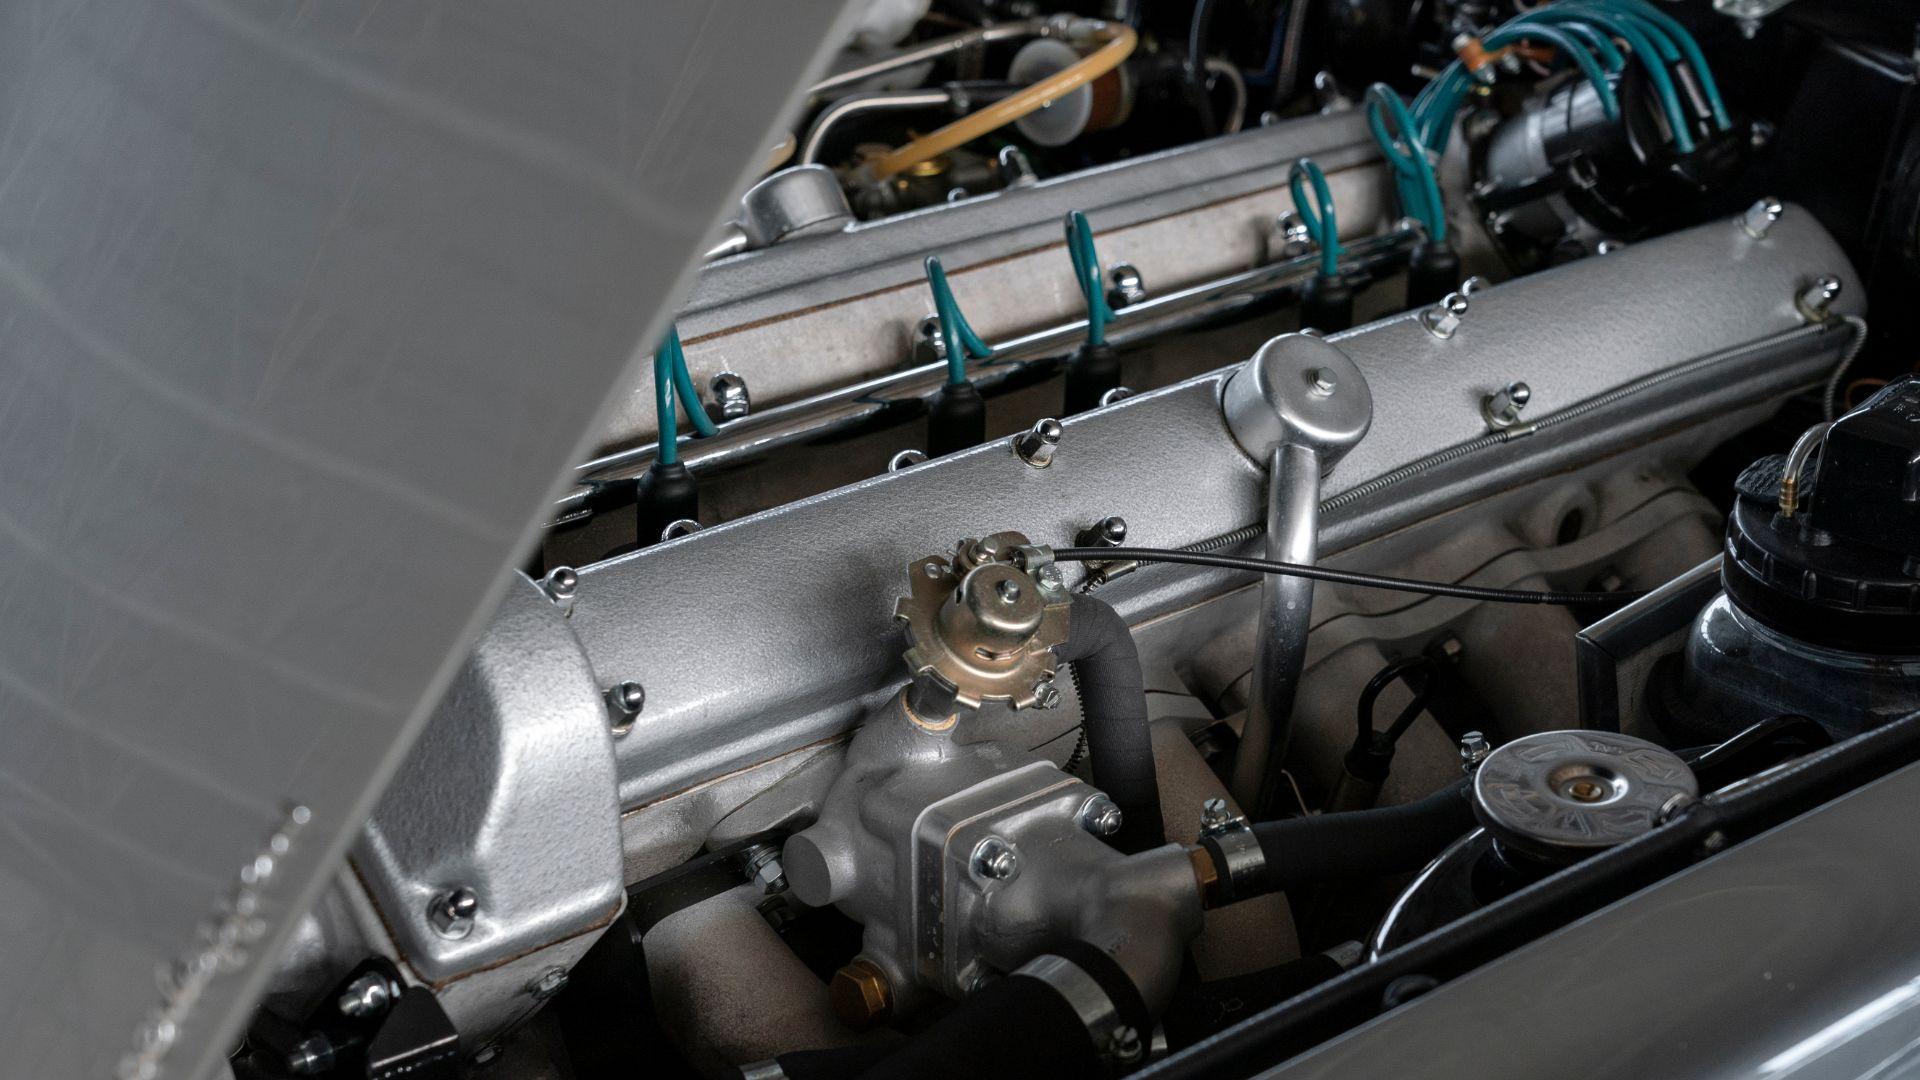 DB5 Vantage: 'Rapid acceleration, higher speeds ensured'